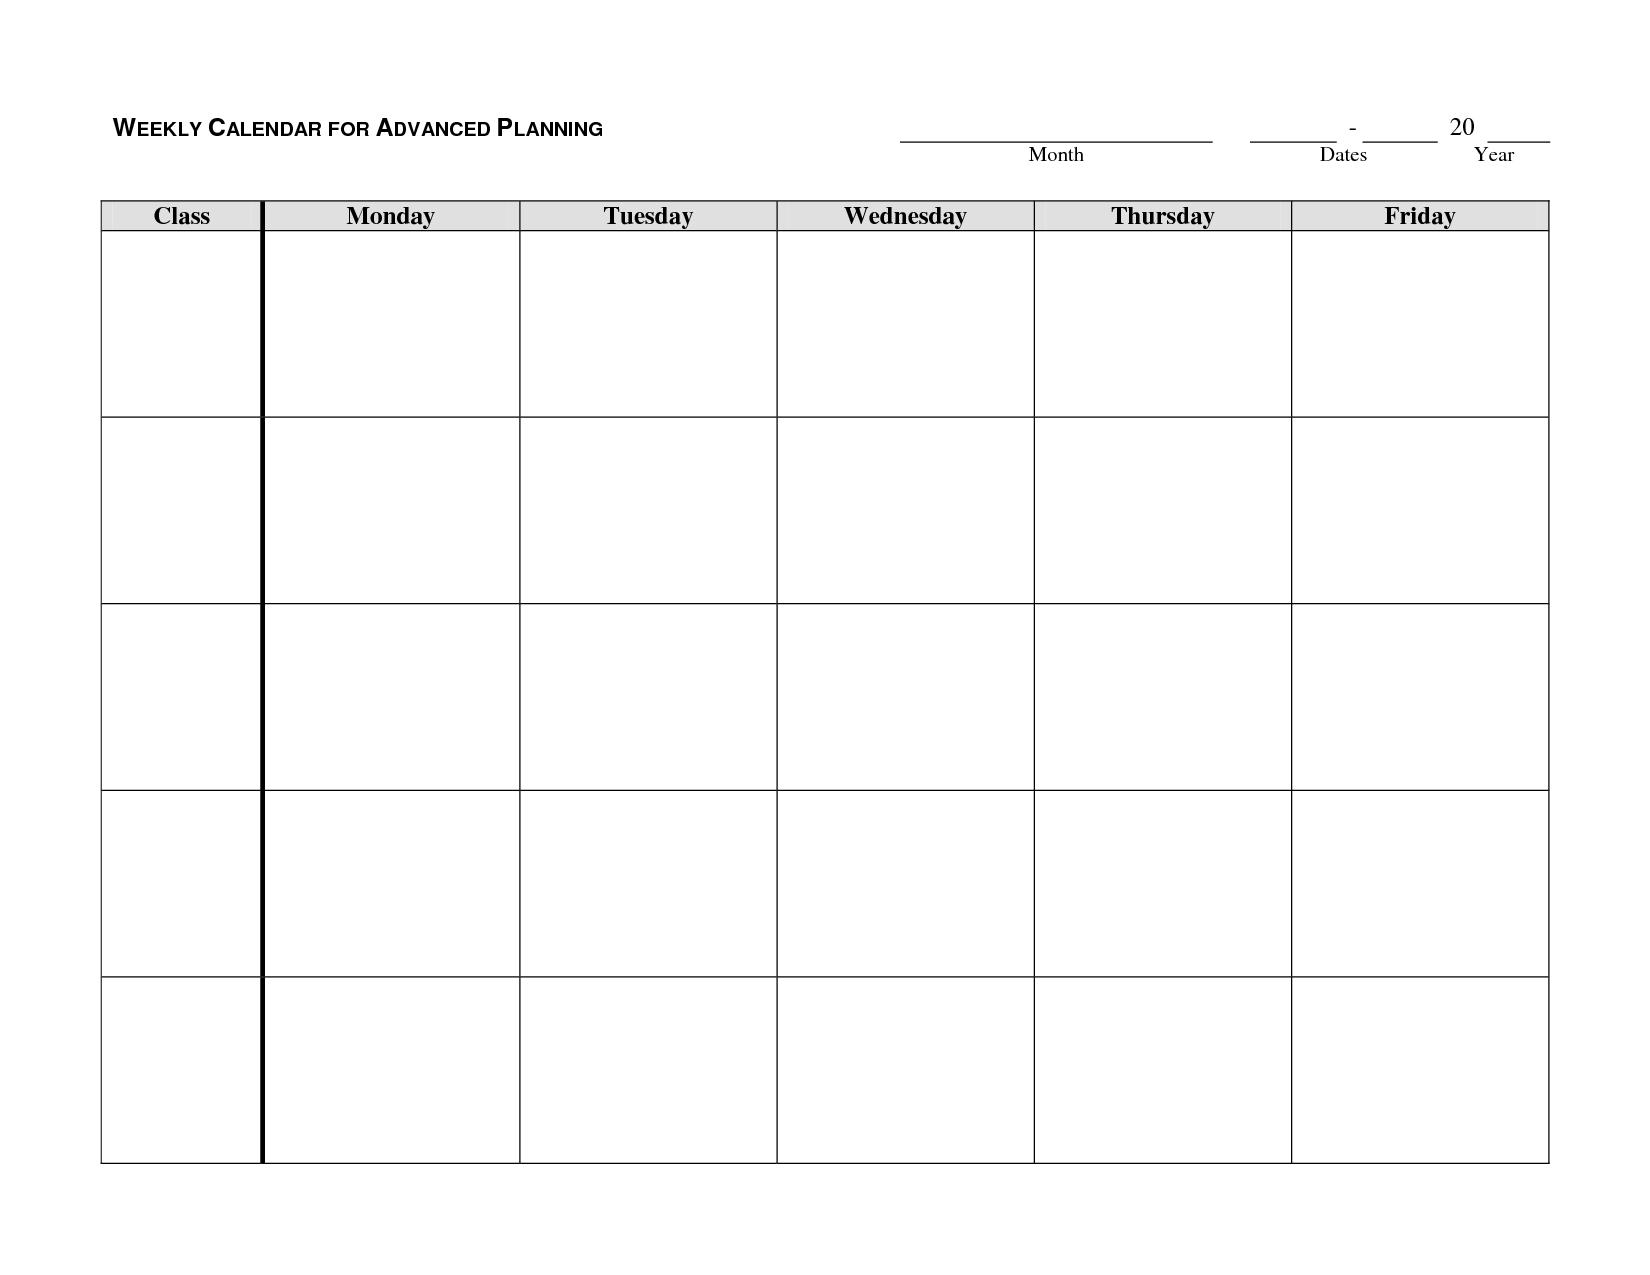 M-F Calendar Template – Get Your Calendar Printable pertaining to Blank Printable Calendar M-F